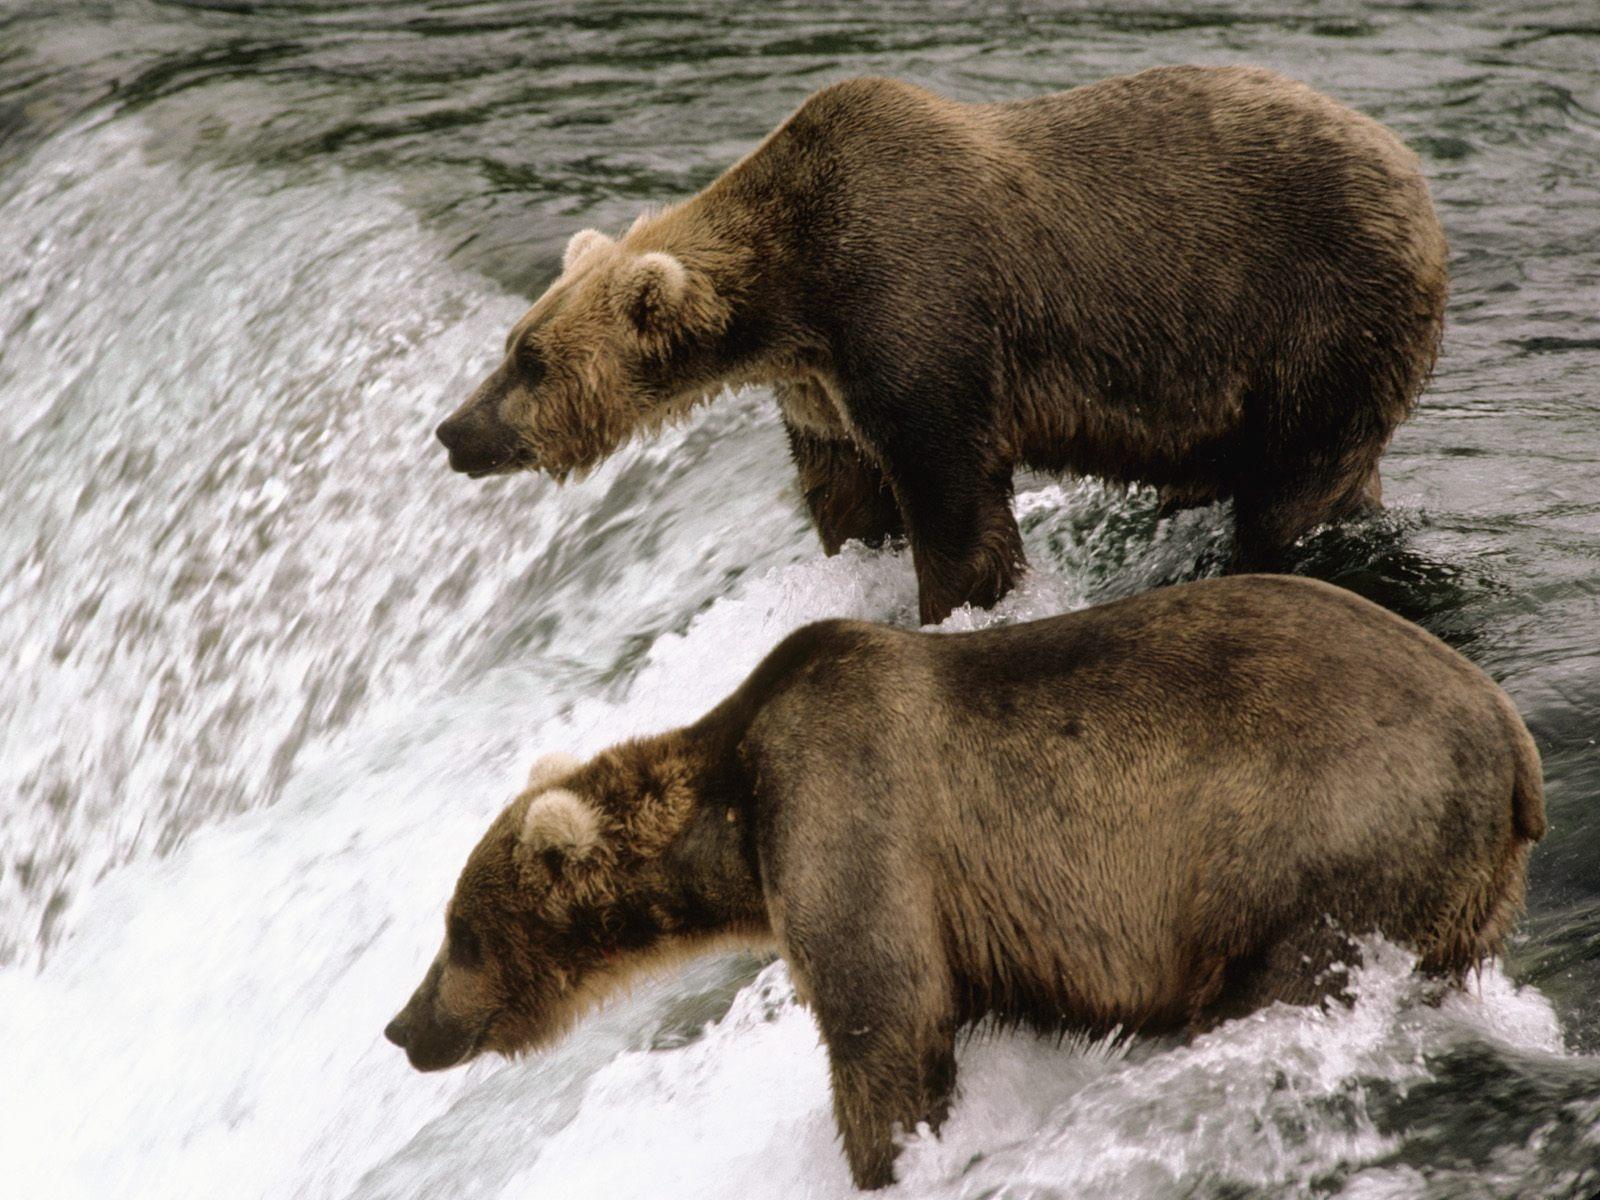 Brown bear wallpaper bears animals wallpapers in jpg format for brown bear wallpaper bears animals wallpapers voltagebd Gallery